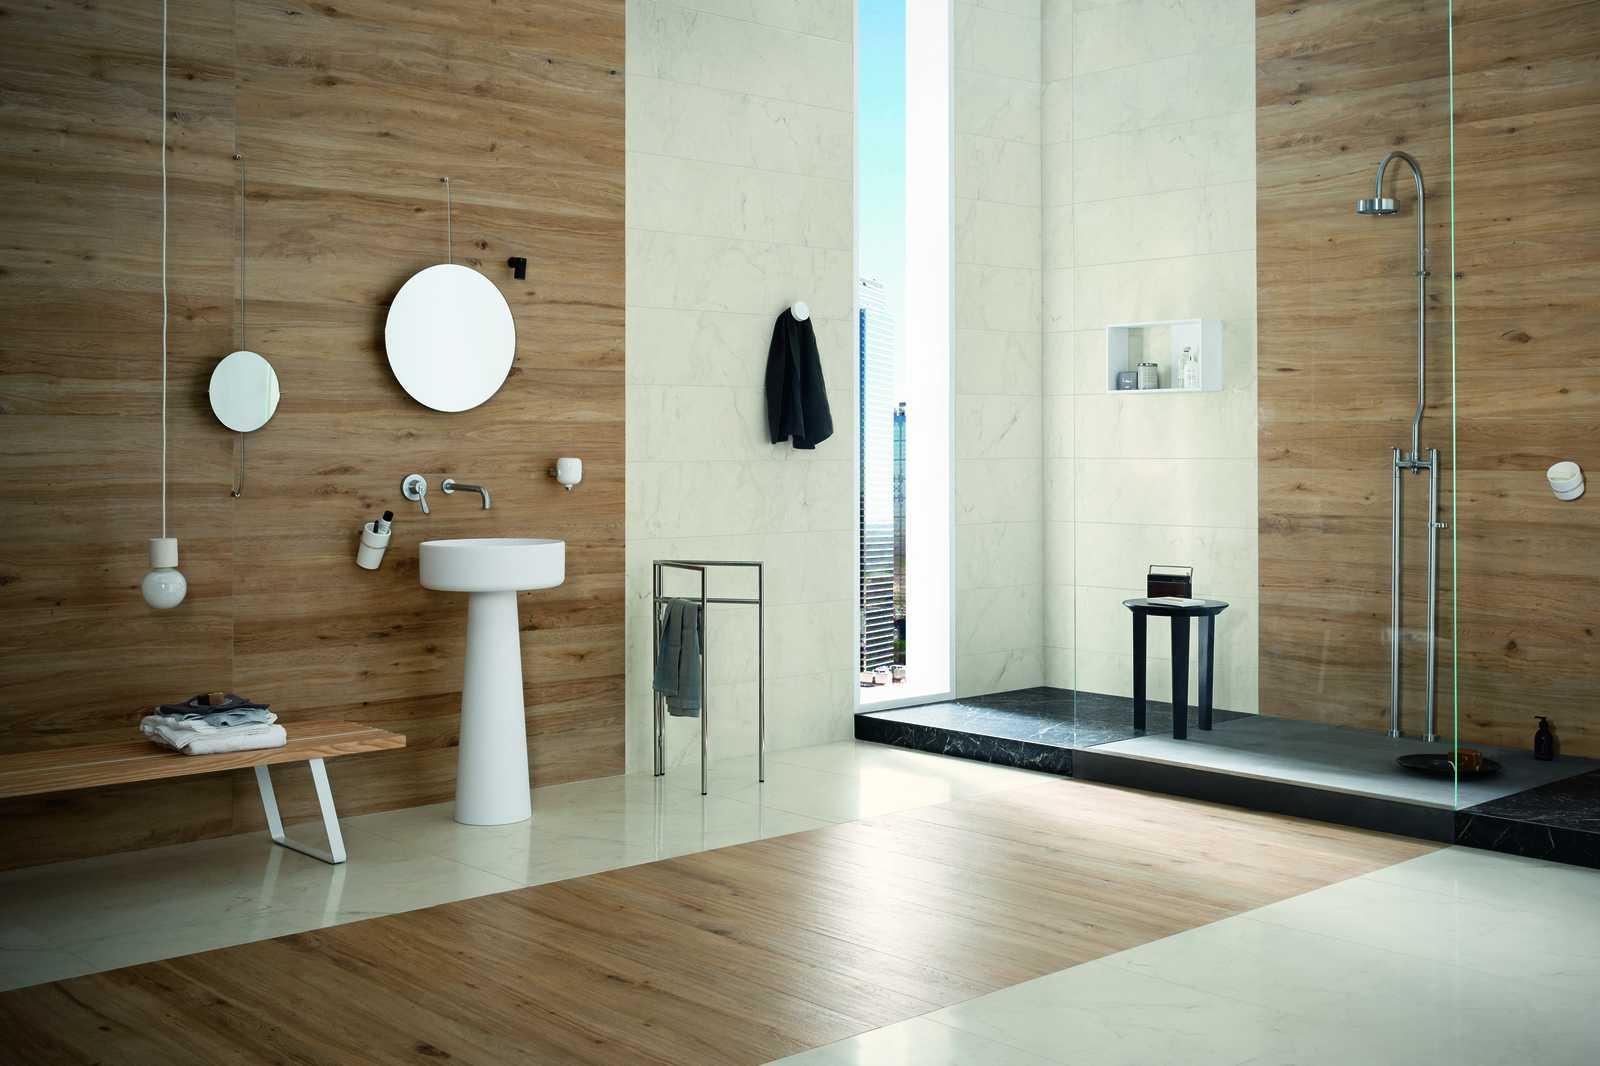 Idee bagni moderni rivestimenti bagno bianco foto bagni economici